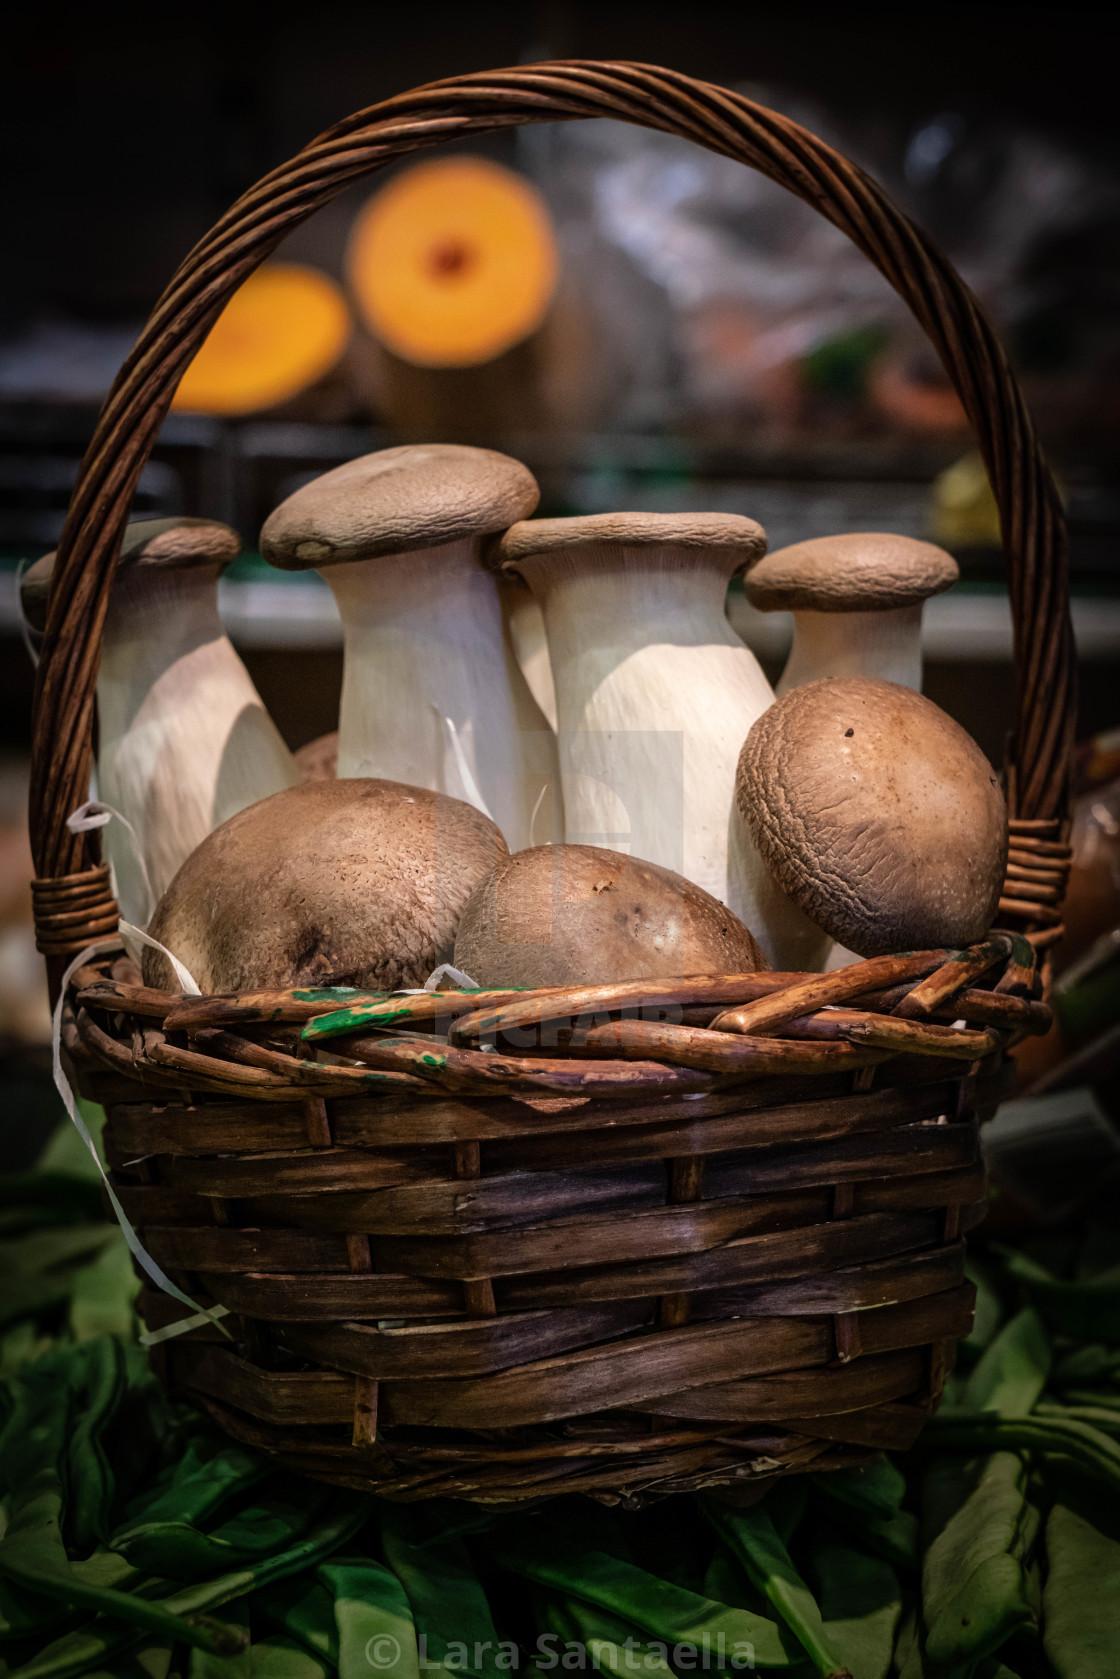 """A basket full of mushrooms"" stock image"